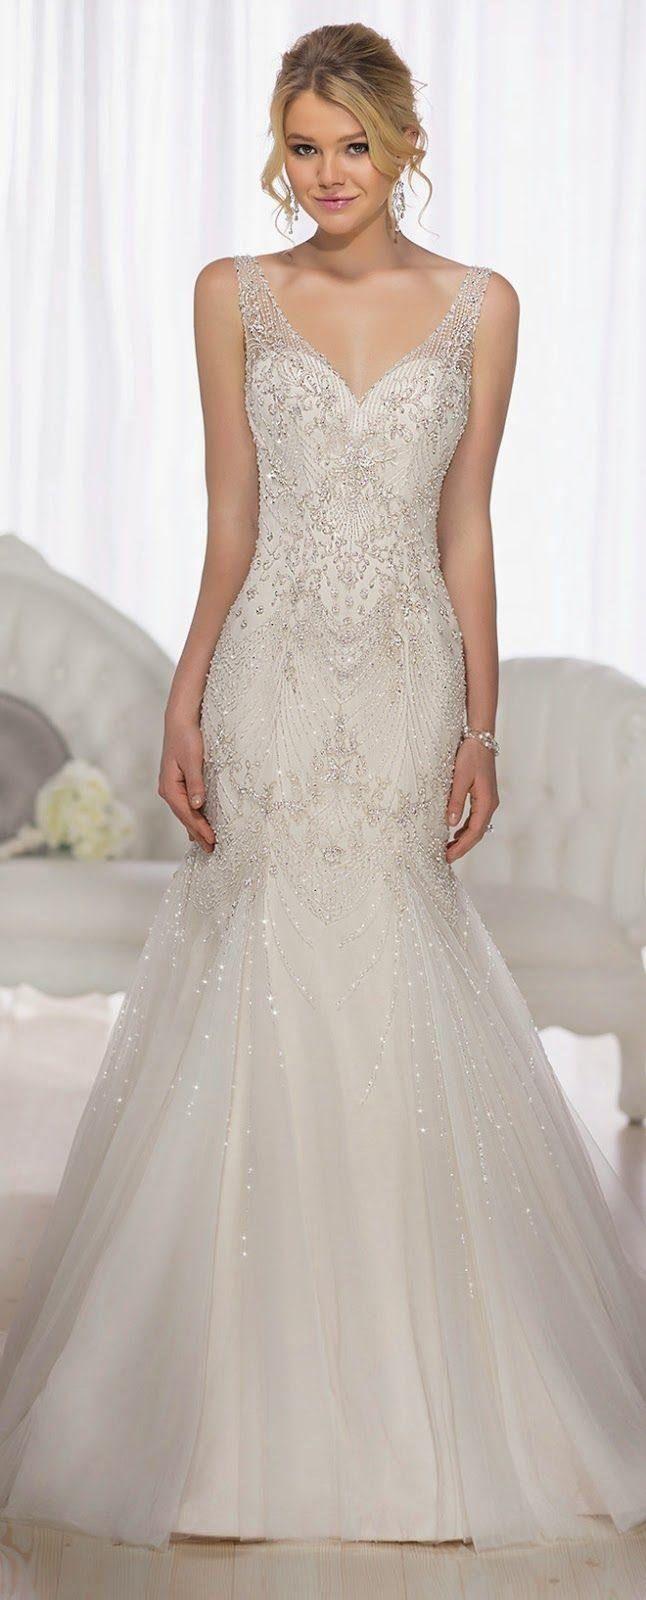 Editor\'s Picks: 22 Amazing Hand-Beaded Wedding Dresses | Australia ...